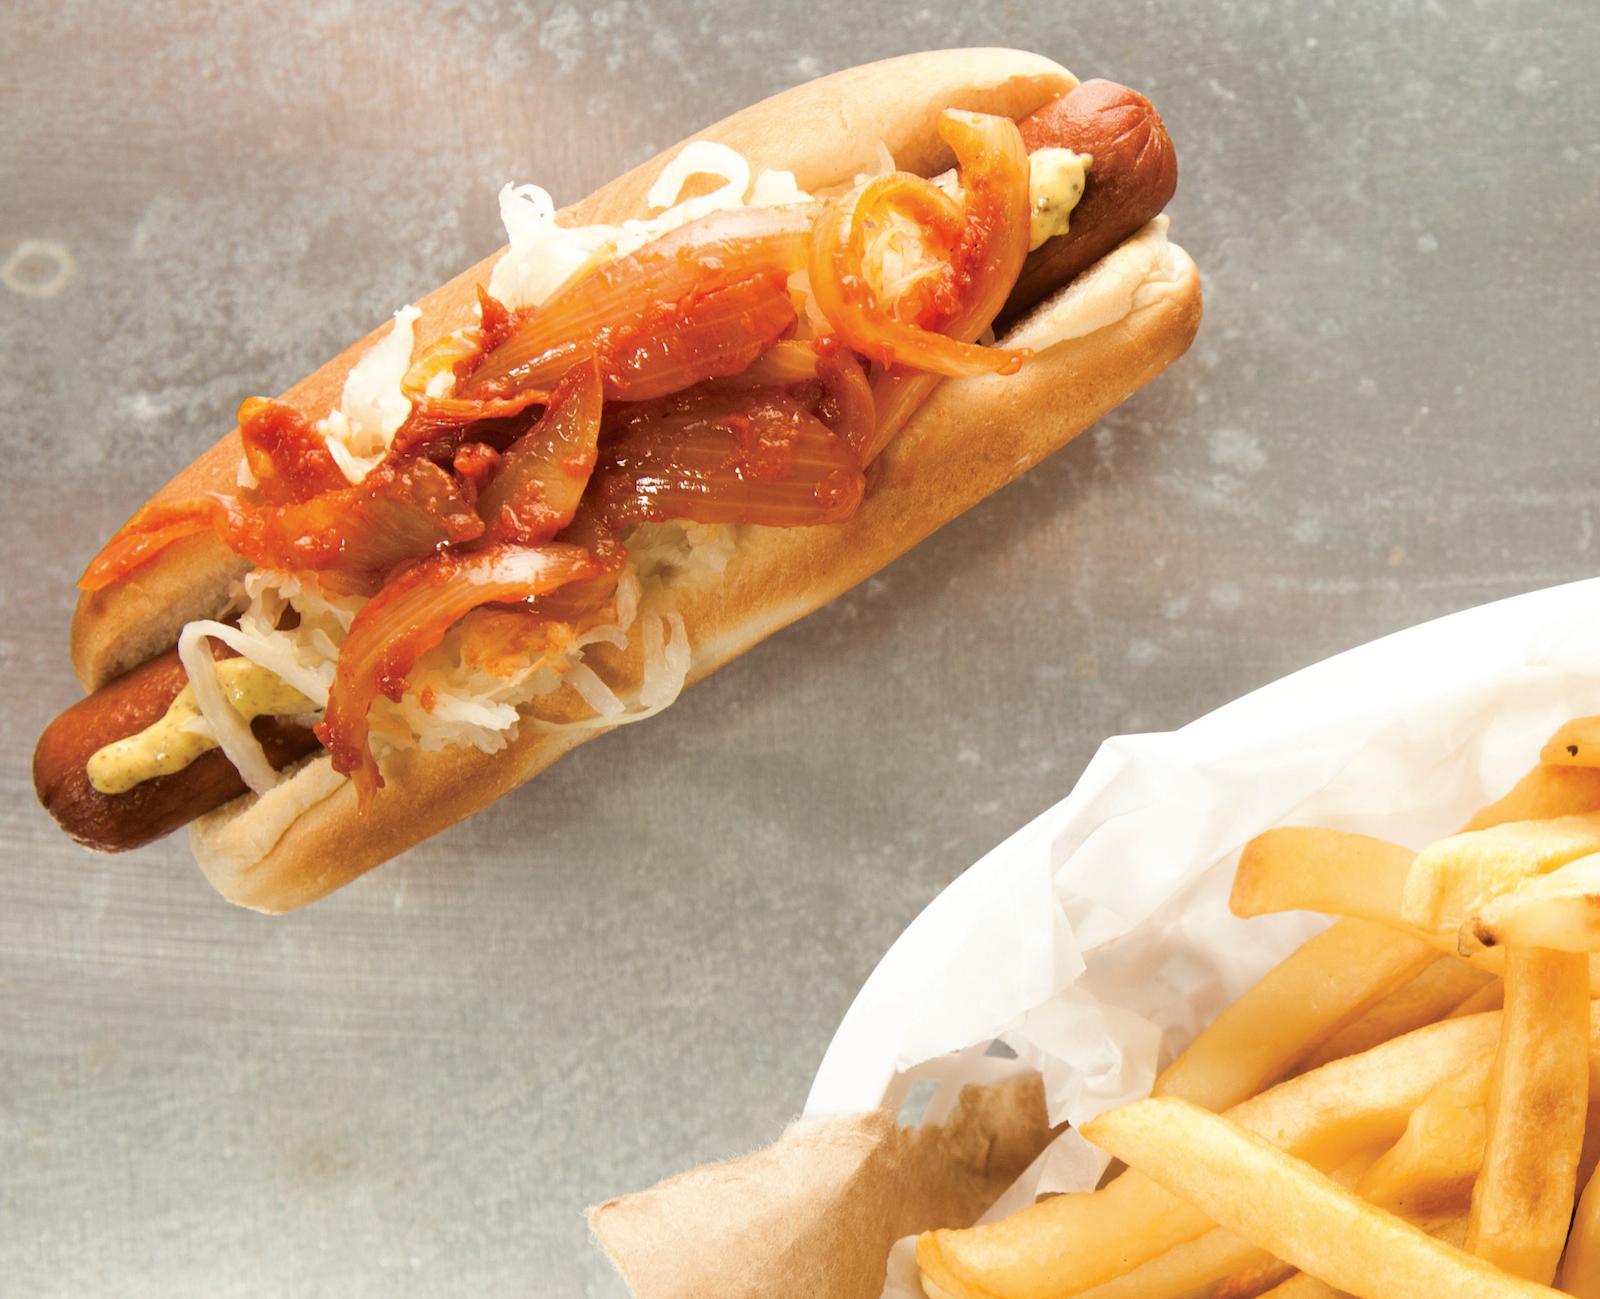 Hot Dog! New York-Style Sautéed Onions Recipe